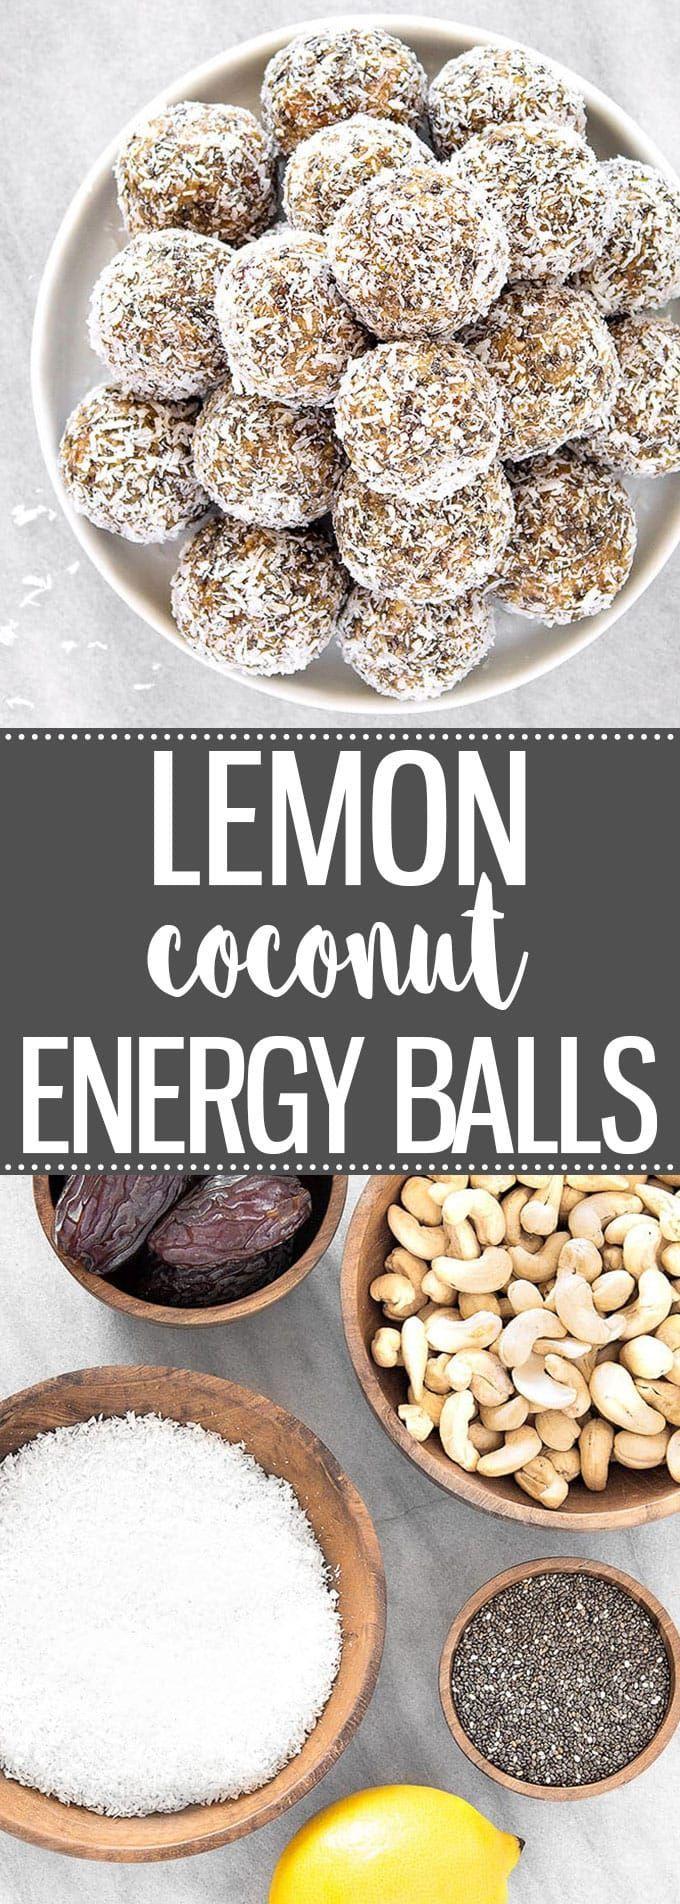 Healthy Lemon Coconut Energy Balls